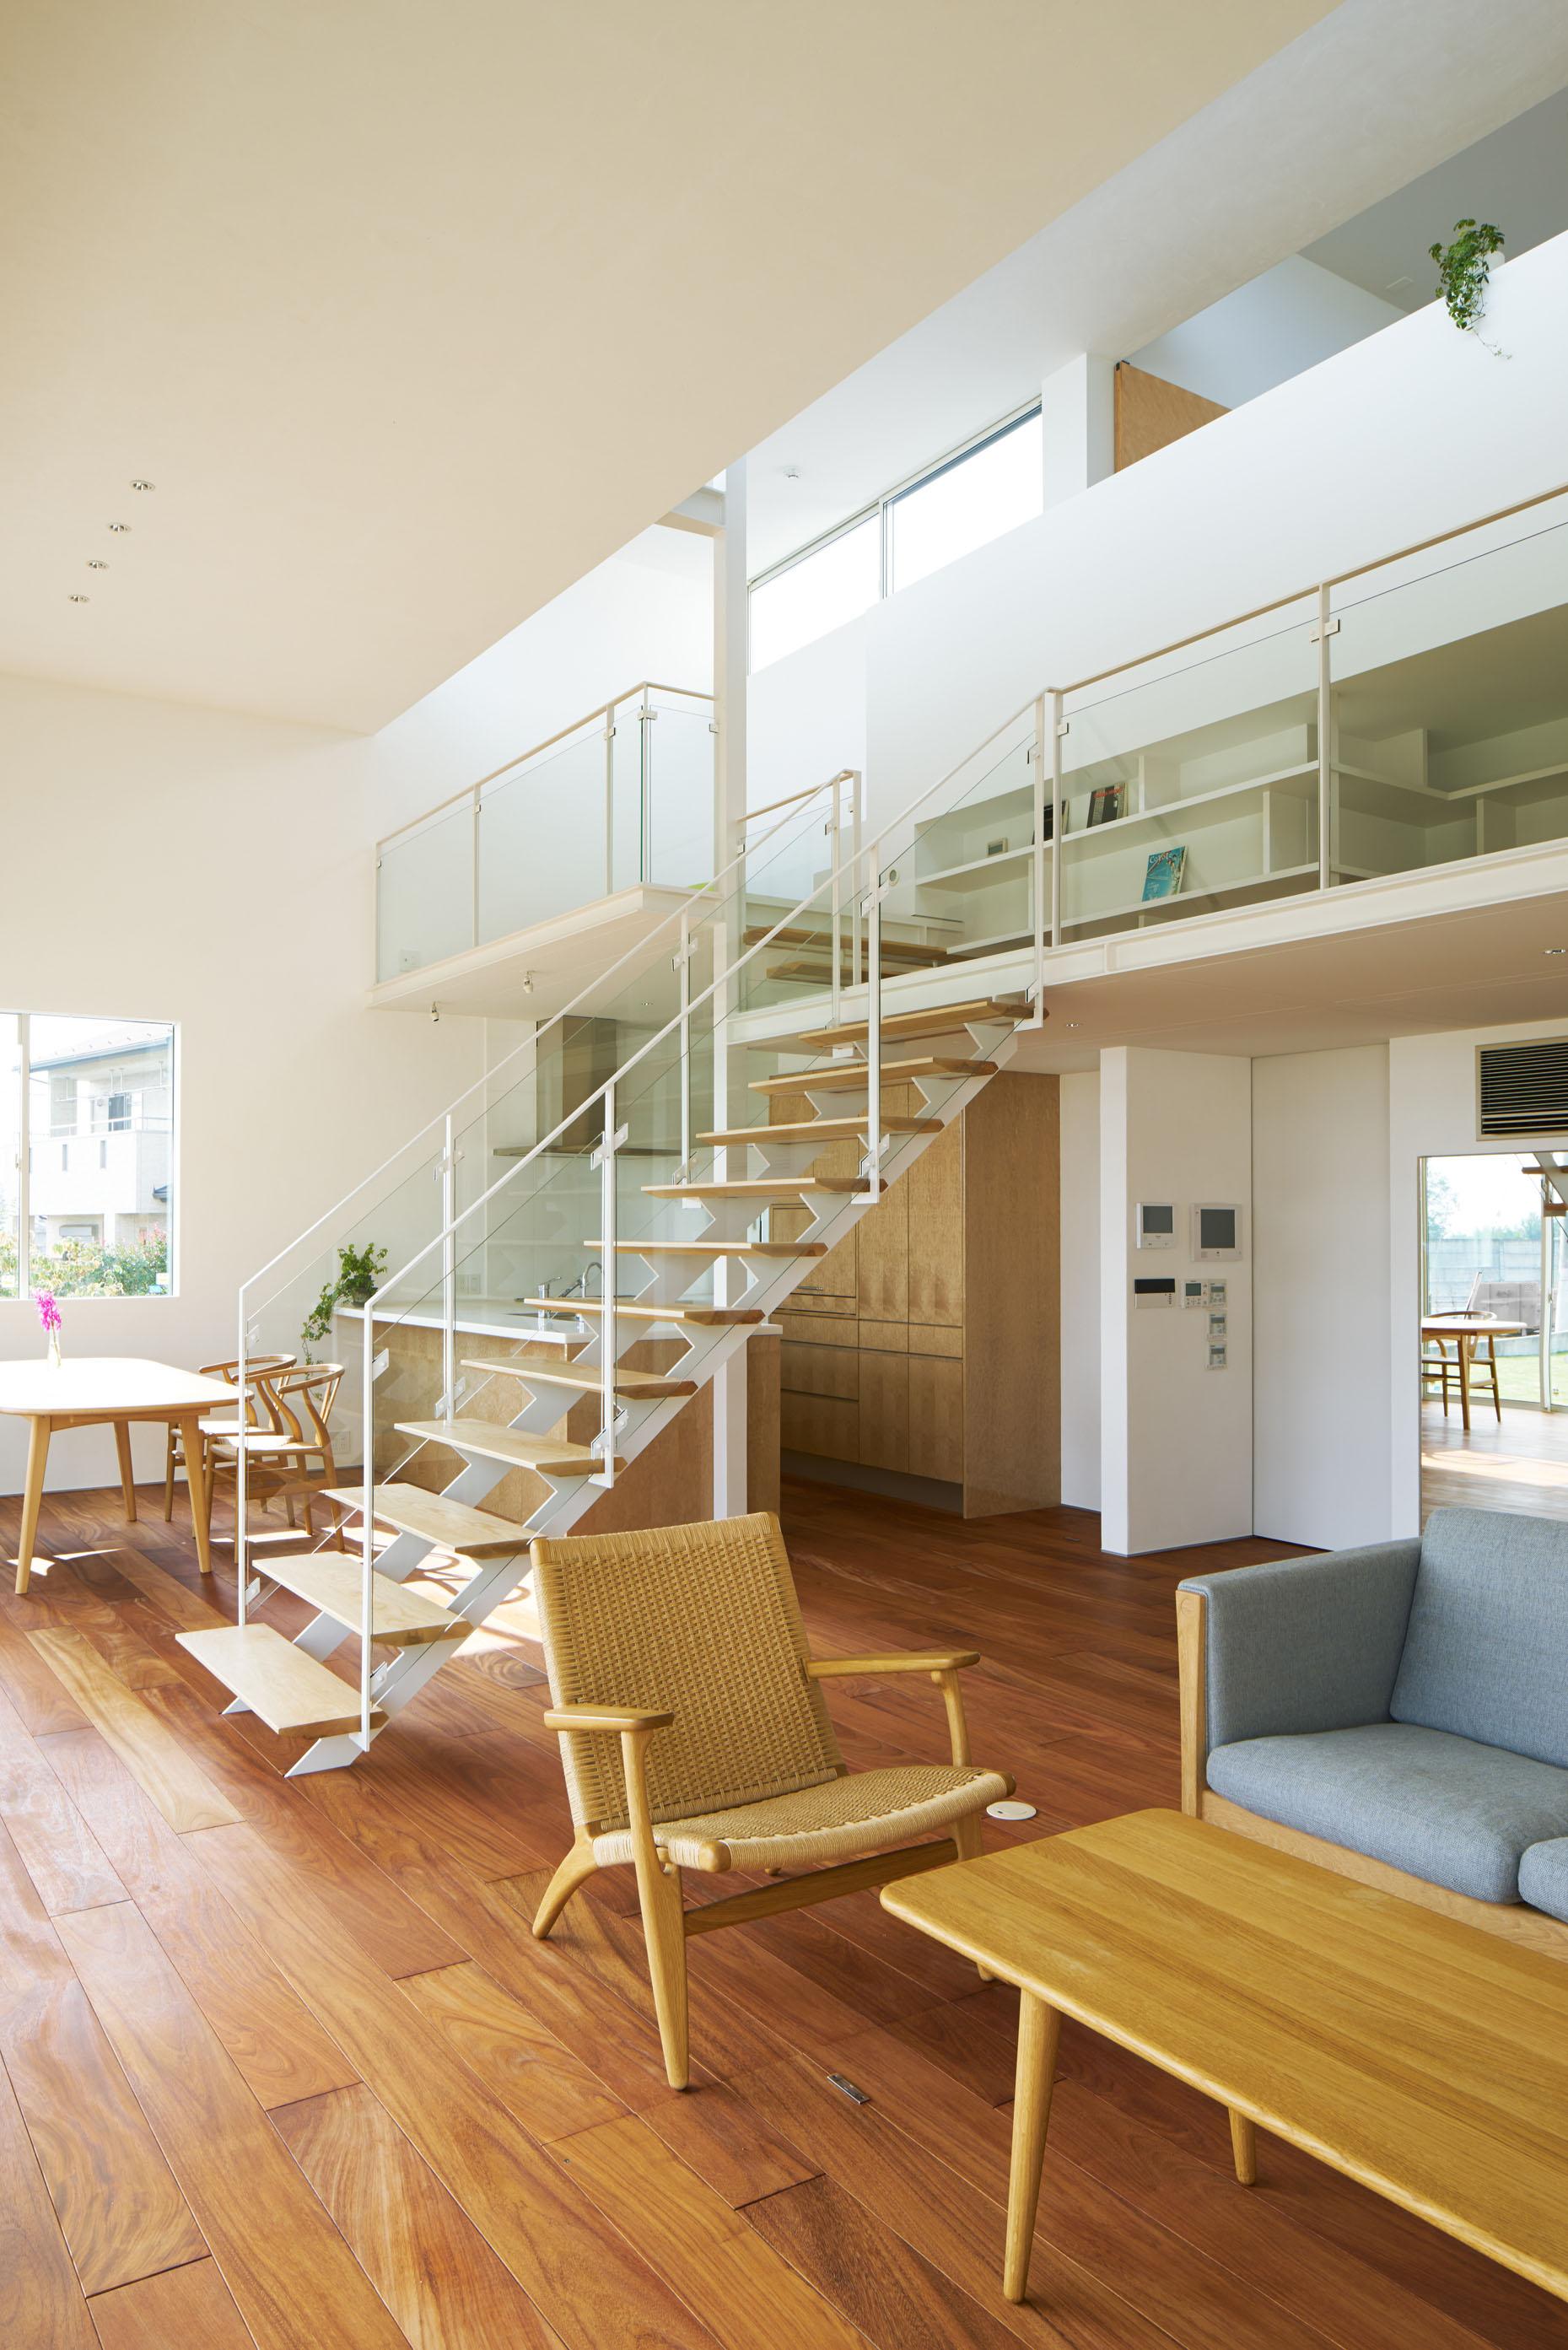 甲斐の家 / House in Kai